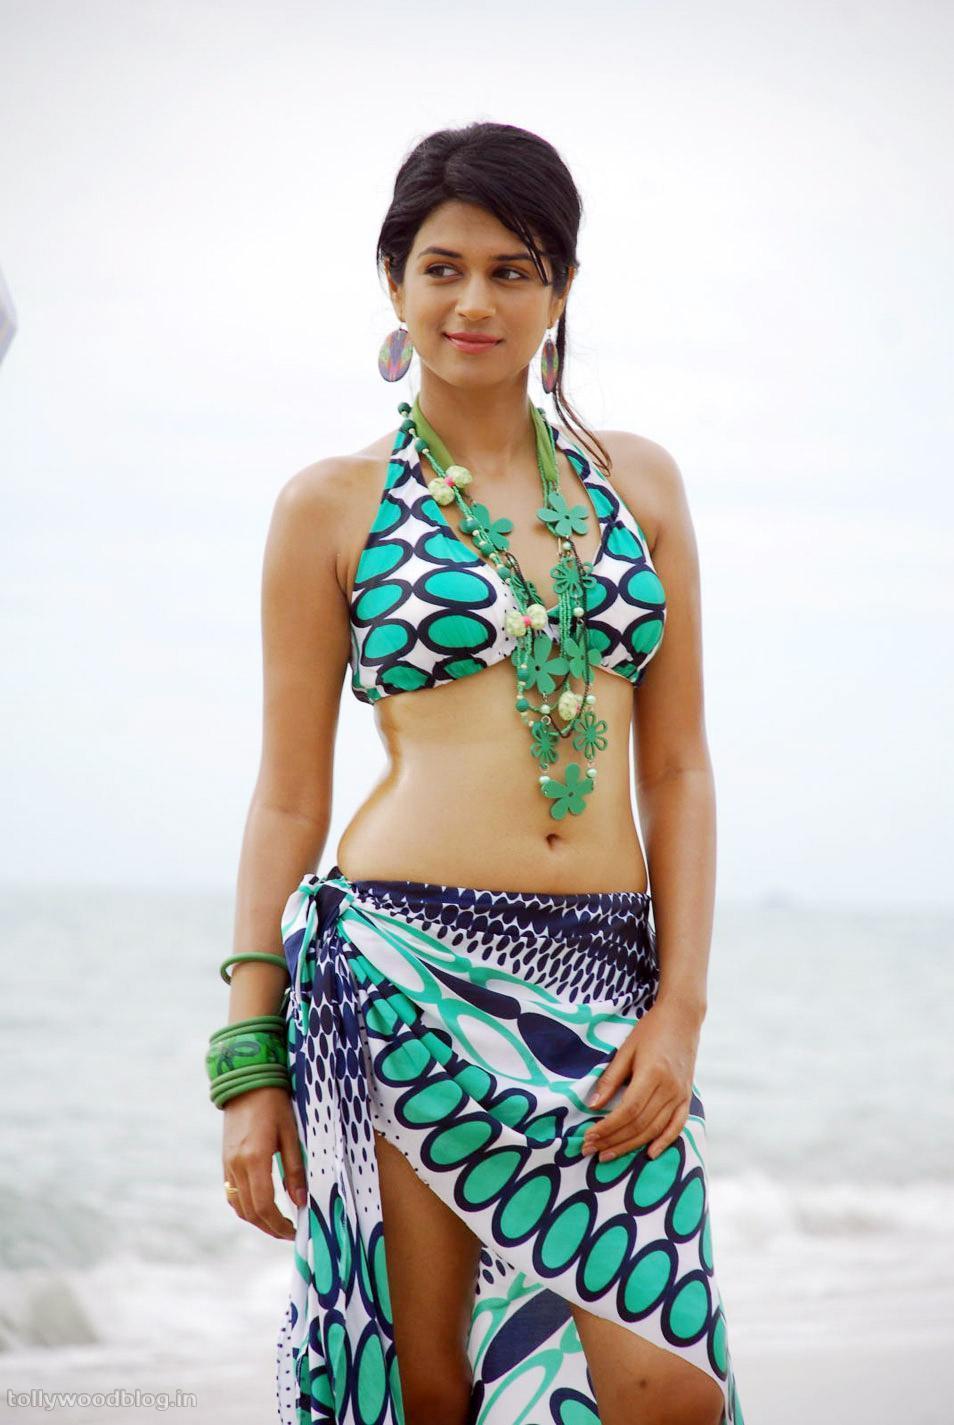 shraddha das hotBeach bikini 001 Spicy Telugu Actress Sharaddha das latest hottest bikini photos from beach ...